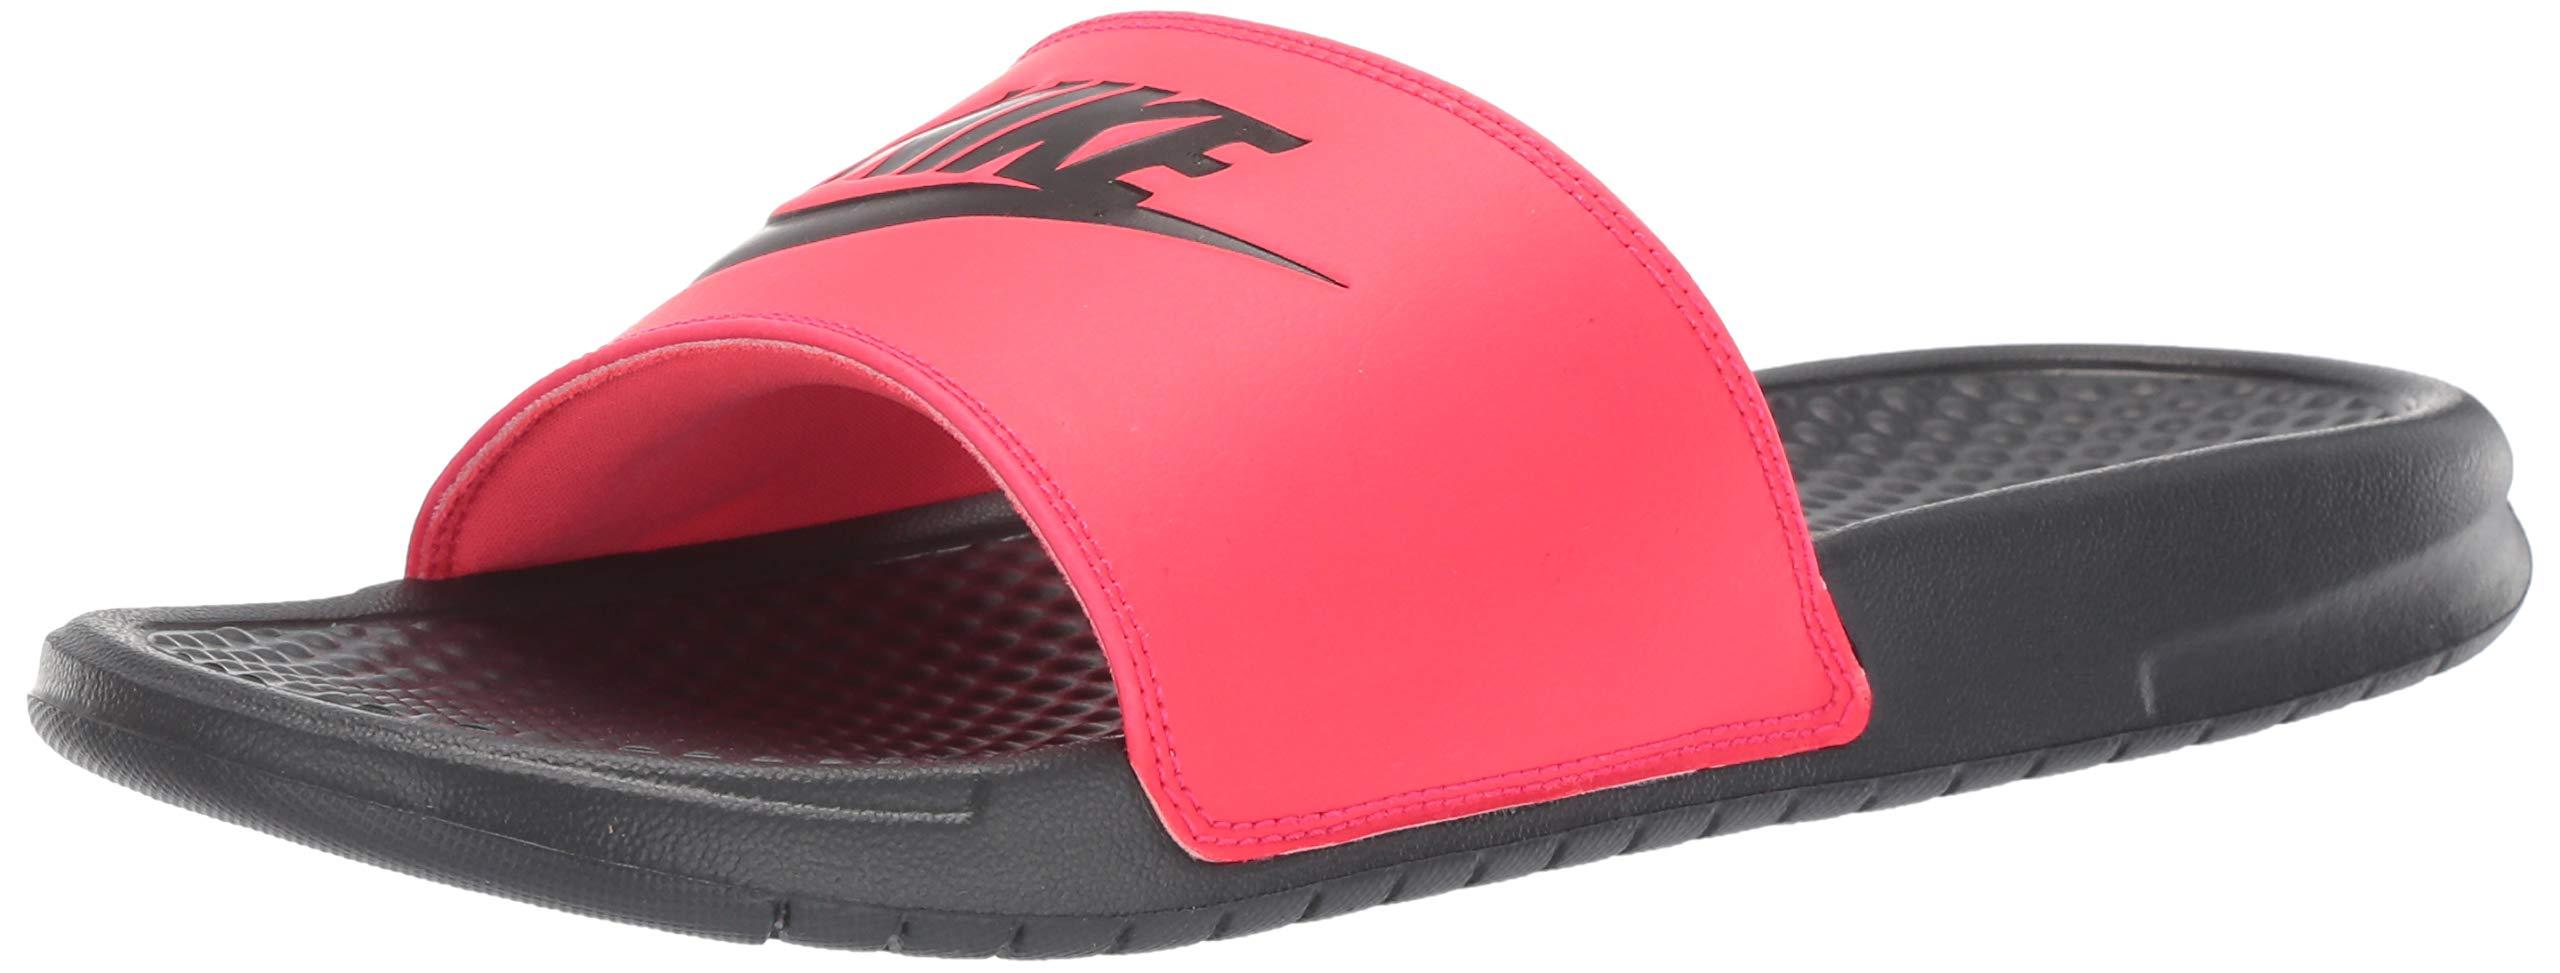 Nike Men's Benassi Just Do It Sandal red Orbit/Black - Anthracite 9 Regular US